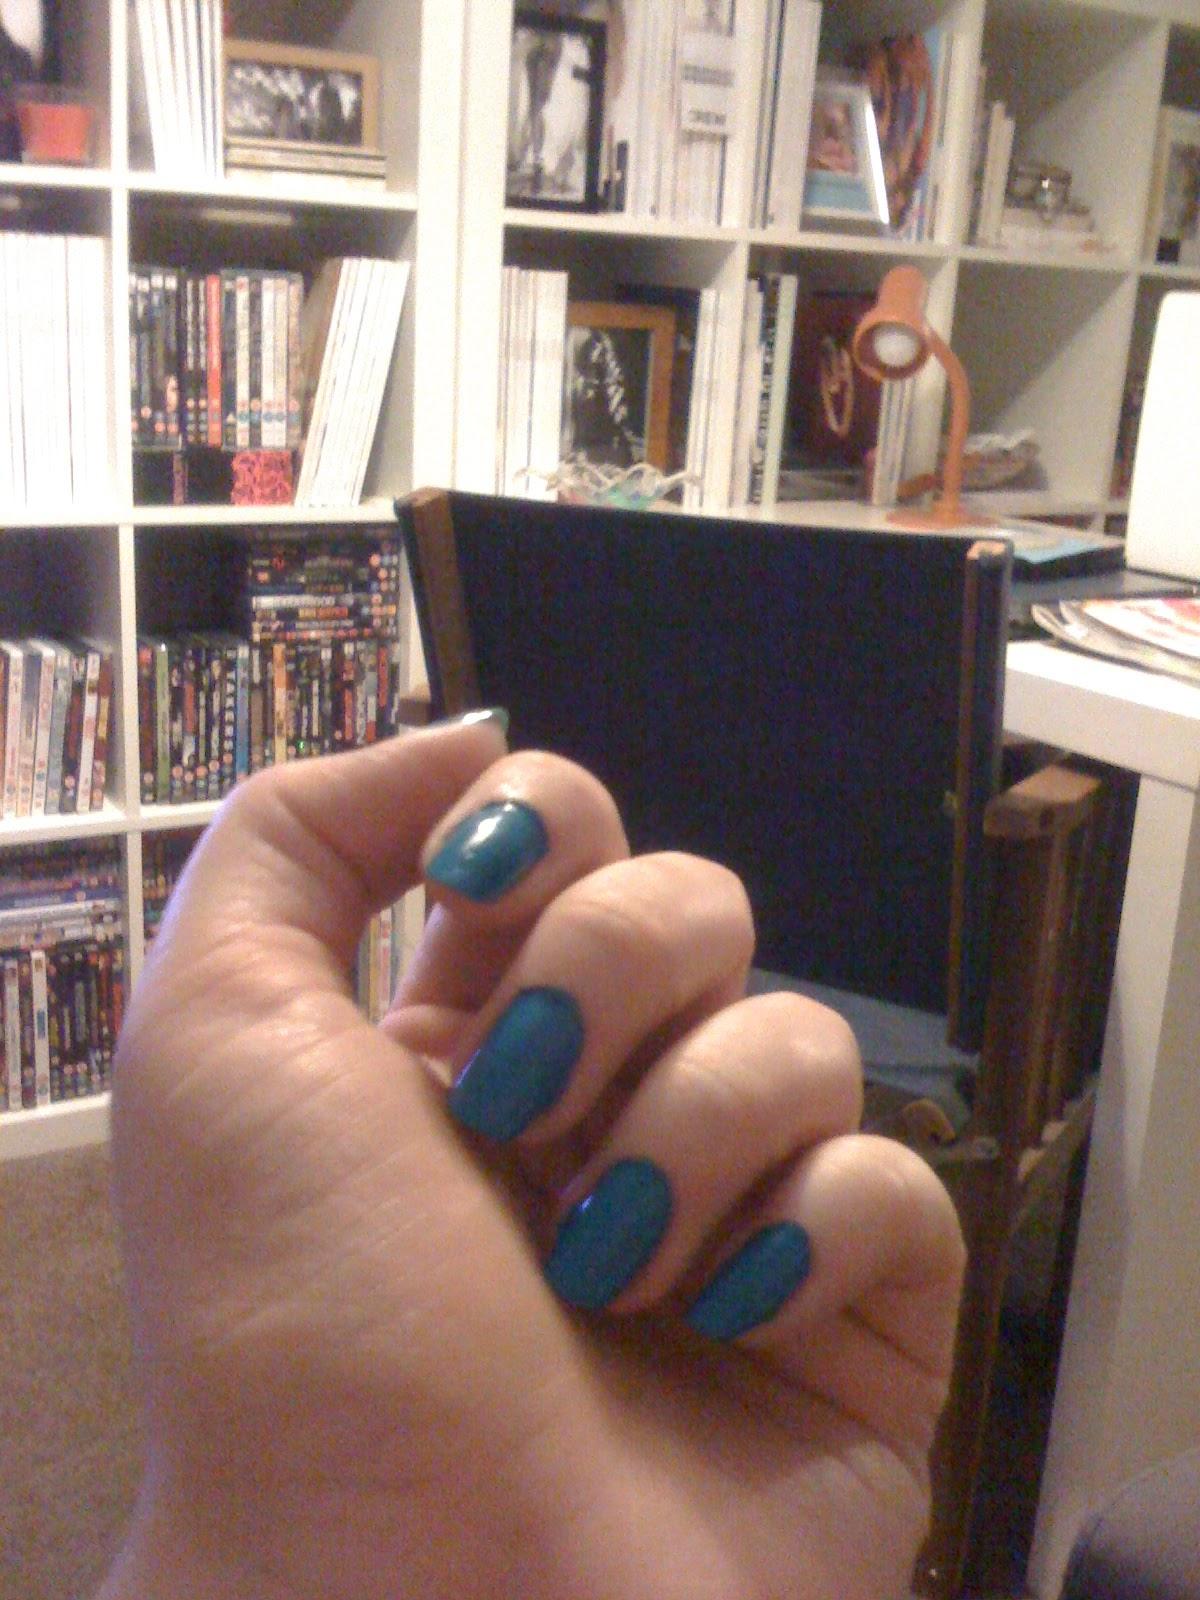 http://4.bp.blogspot.com/-e6bRqcLoMSQ/T-2nyru0dkI/AAAAAAAAA8s/5rQbVaoqxZI/s1600/H&M+Teal+nails.JPG